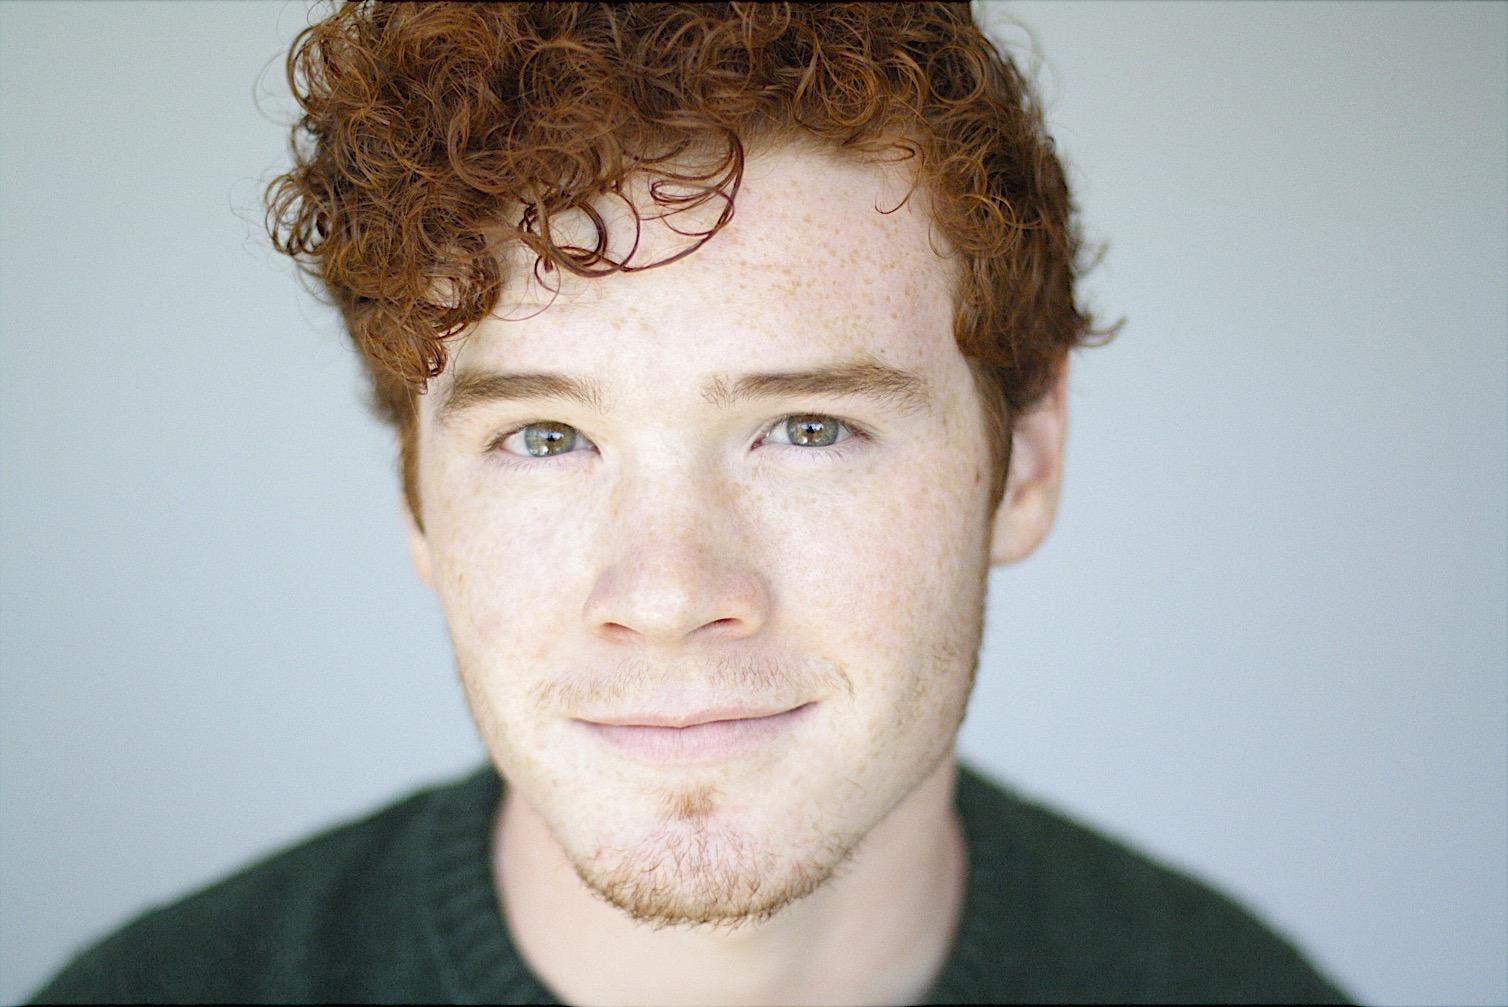 Landon Tate Boyle